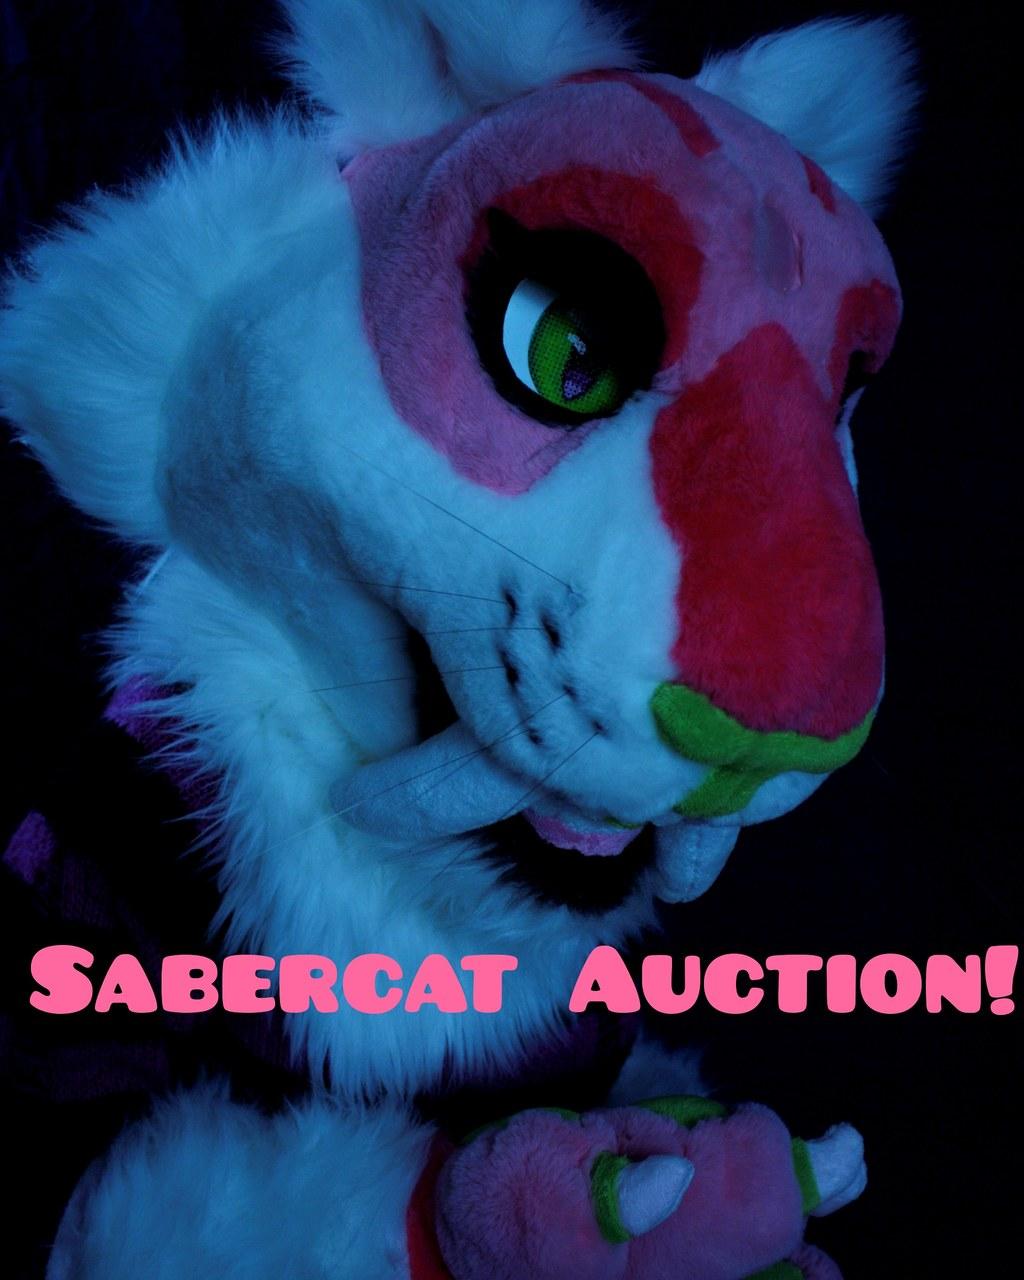 Most recent image: Saber still up for auction!